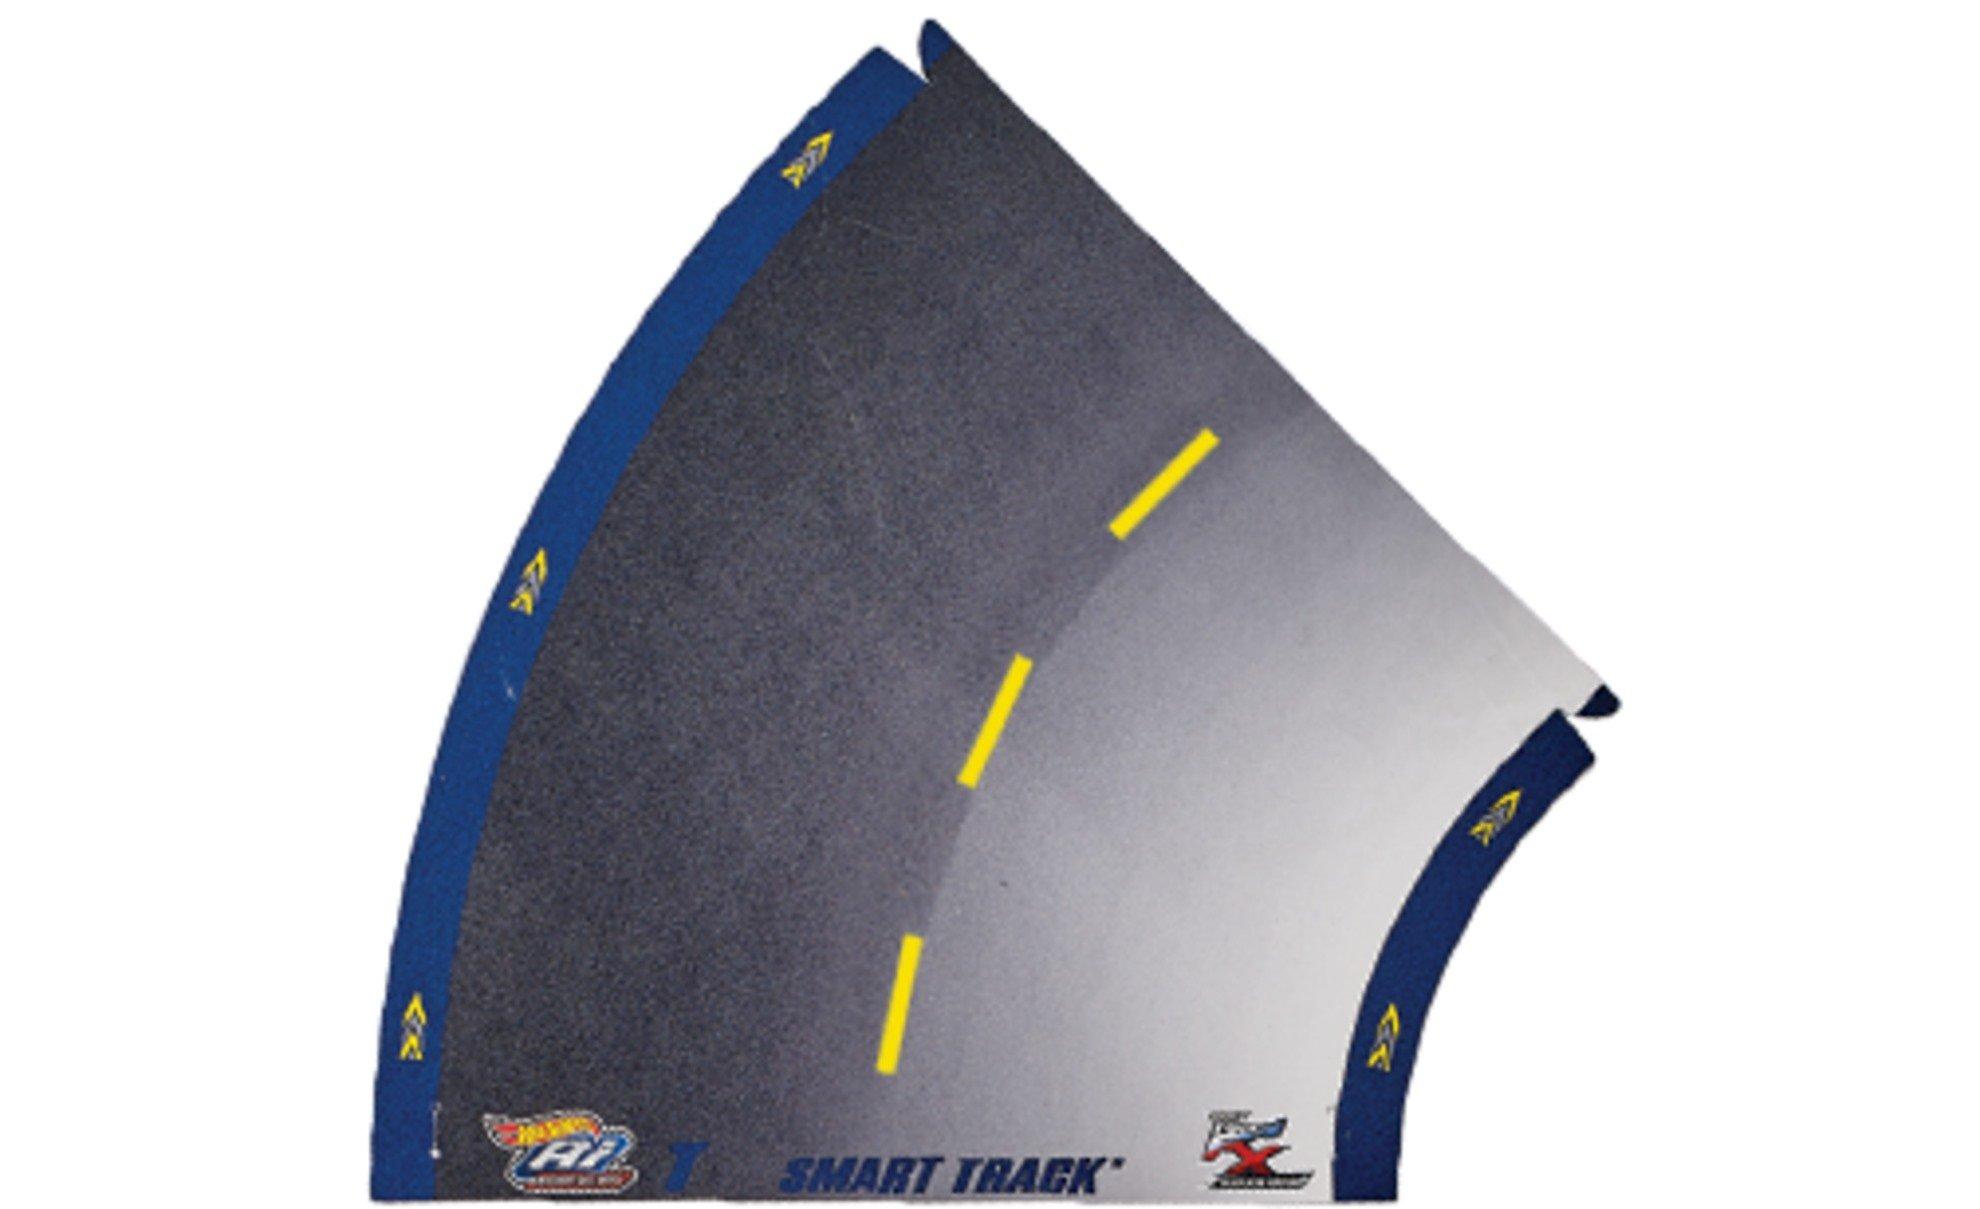 Hot Wheels Ai Starter Set Street Racing Edition by Hot Wheels (Image #21)